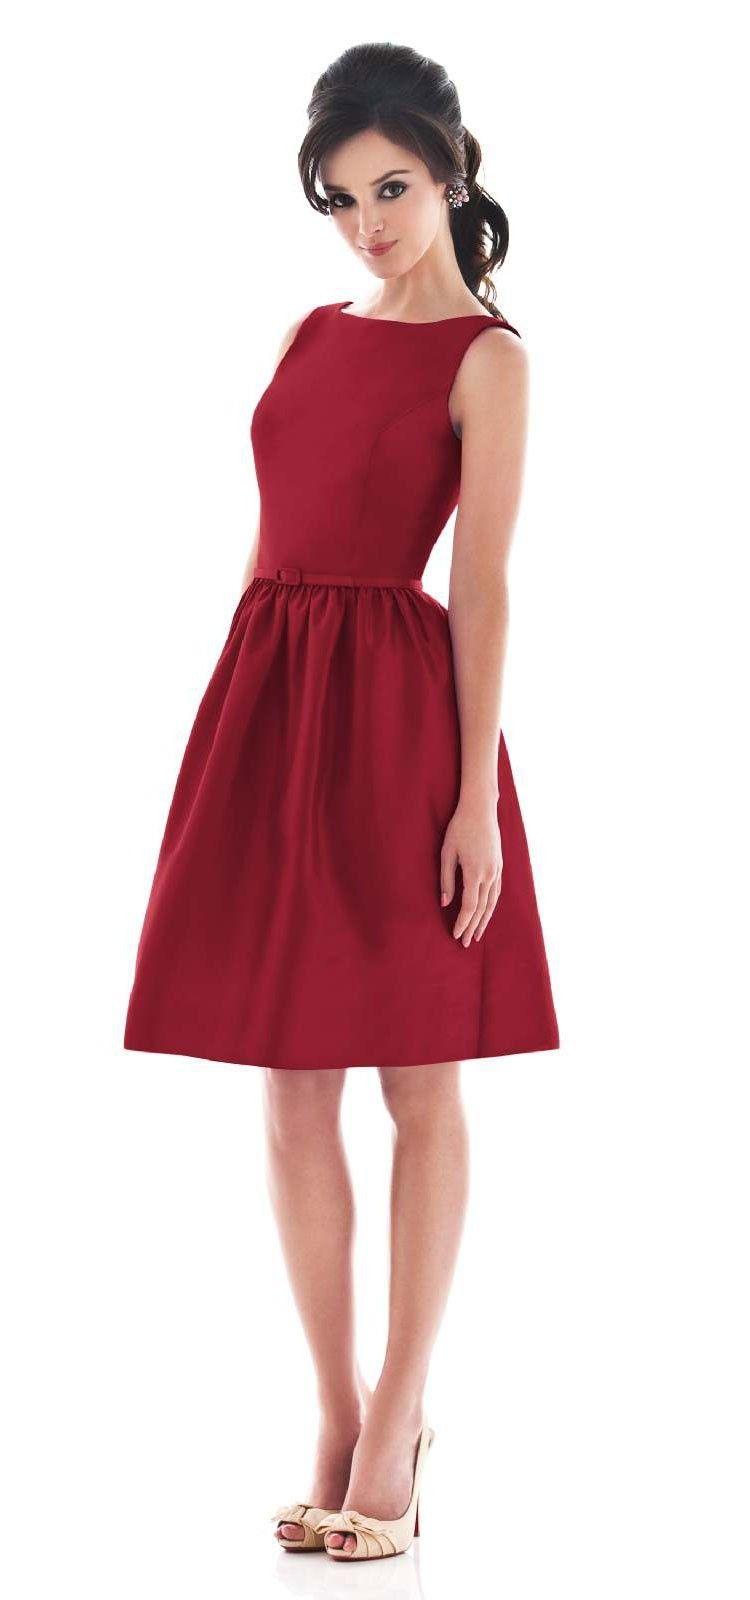 Red simple bateau neck short bridesmaid dress g danius wedding